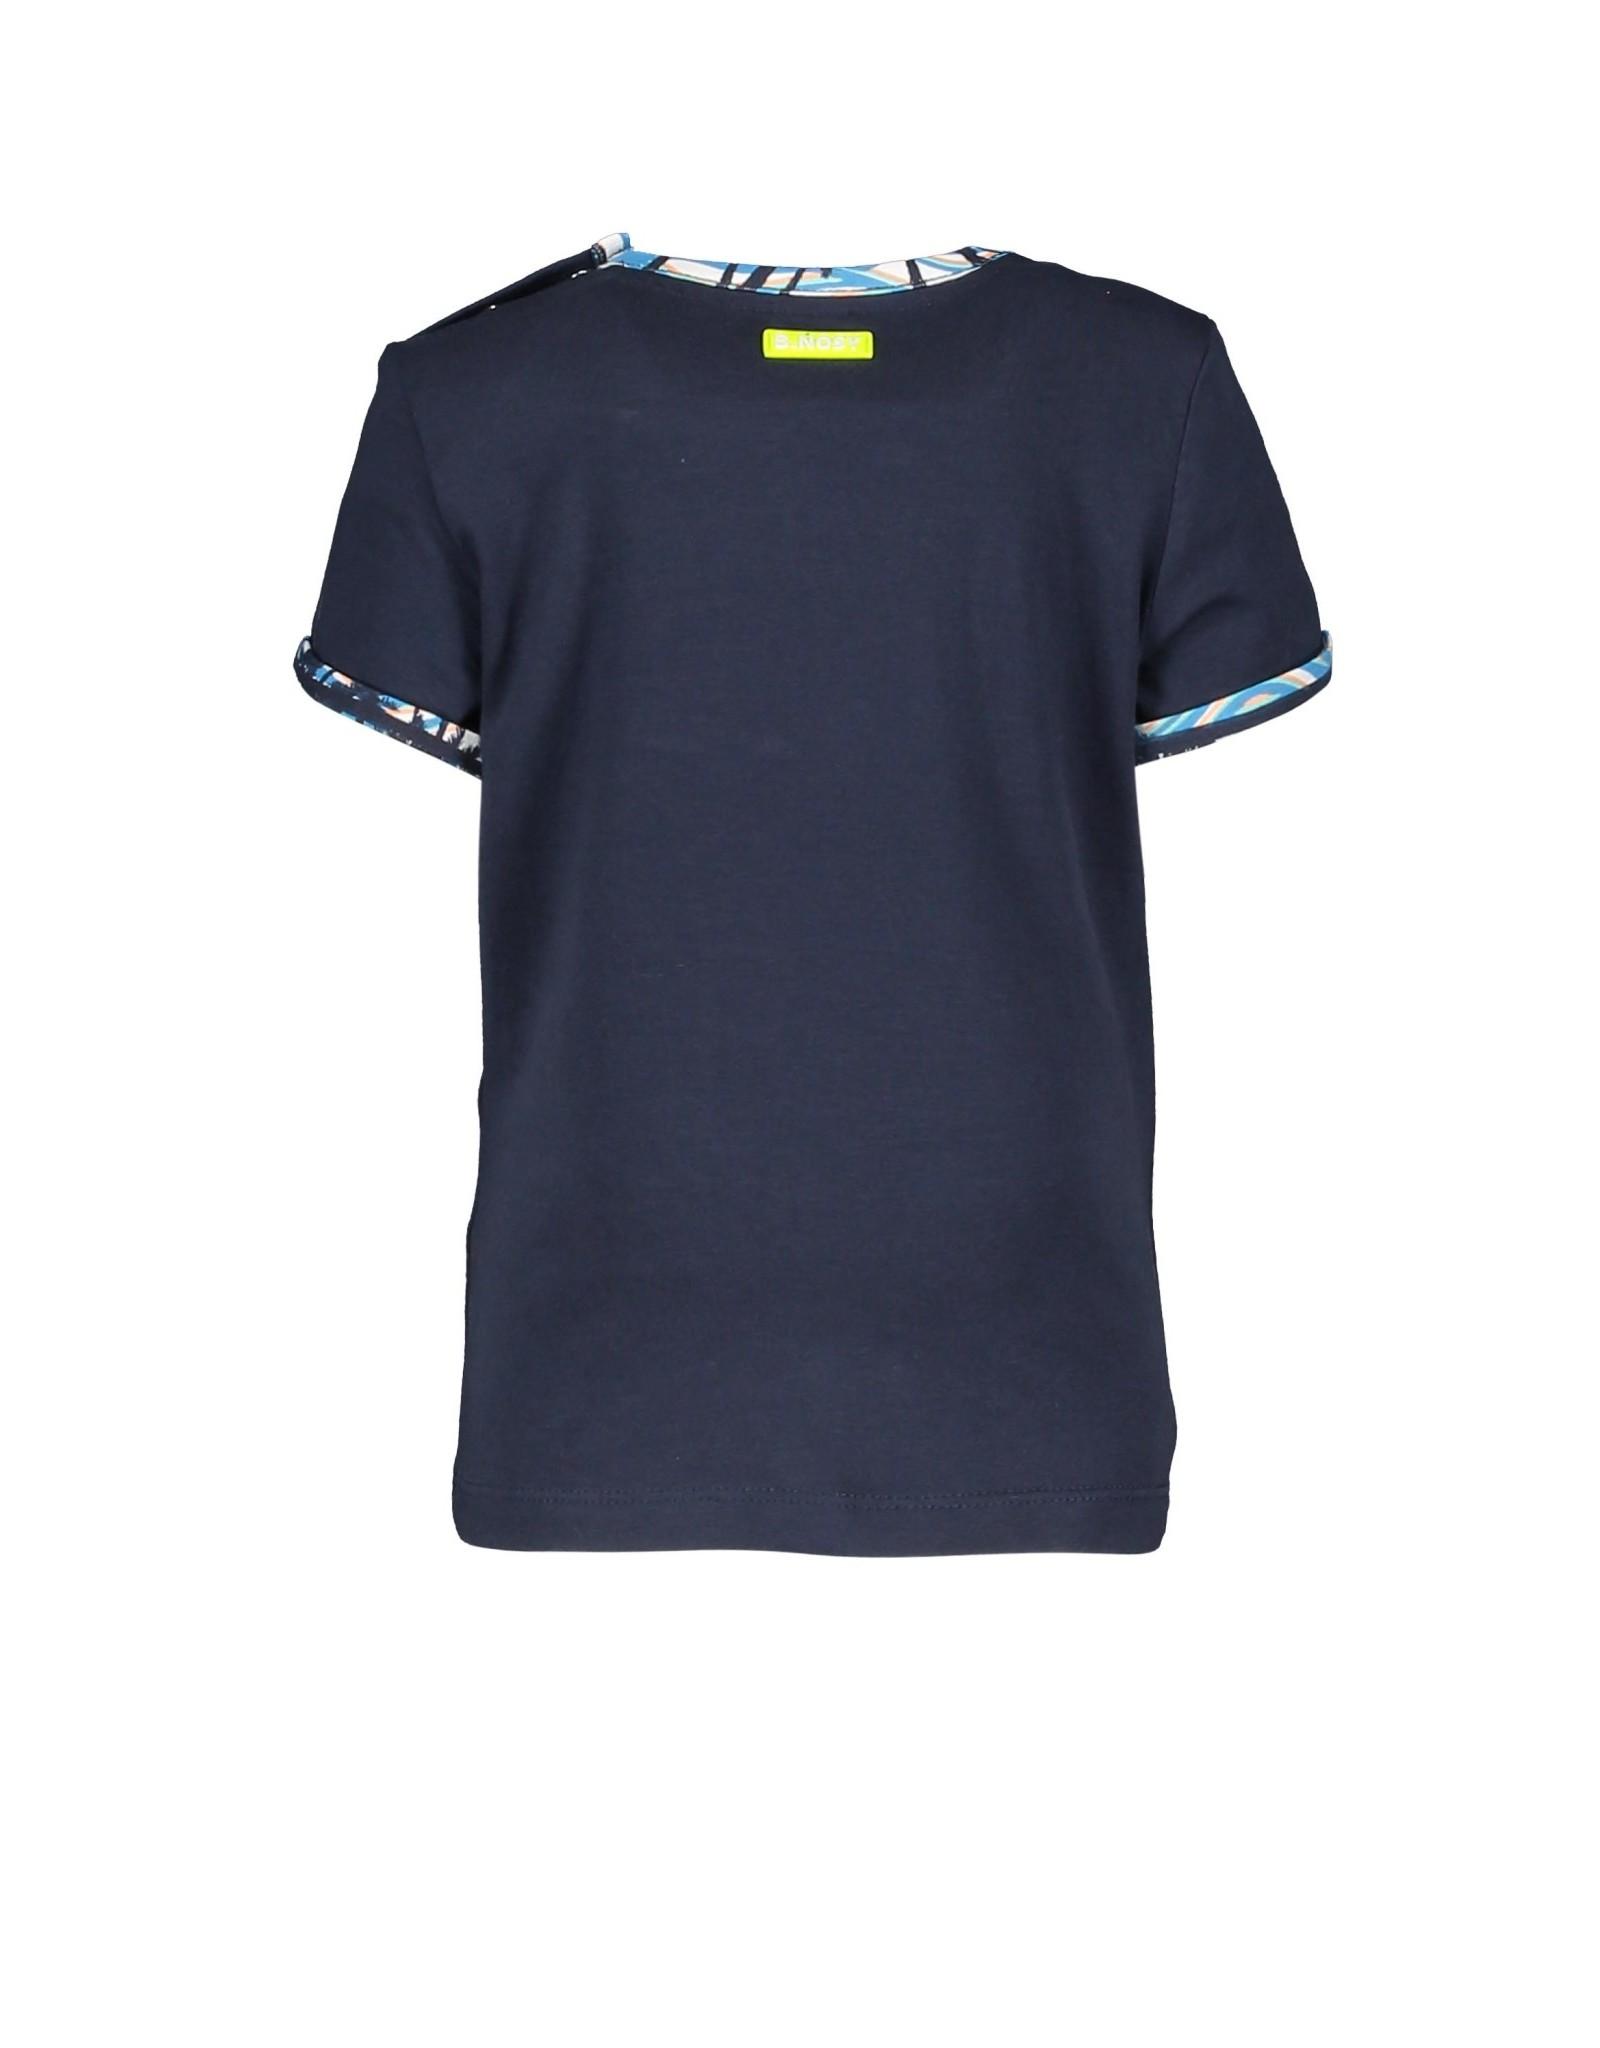 B.Nosy B.Nosy baby jongens t-shirt Dude Oxford Blue